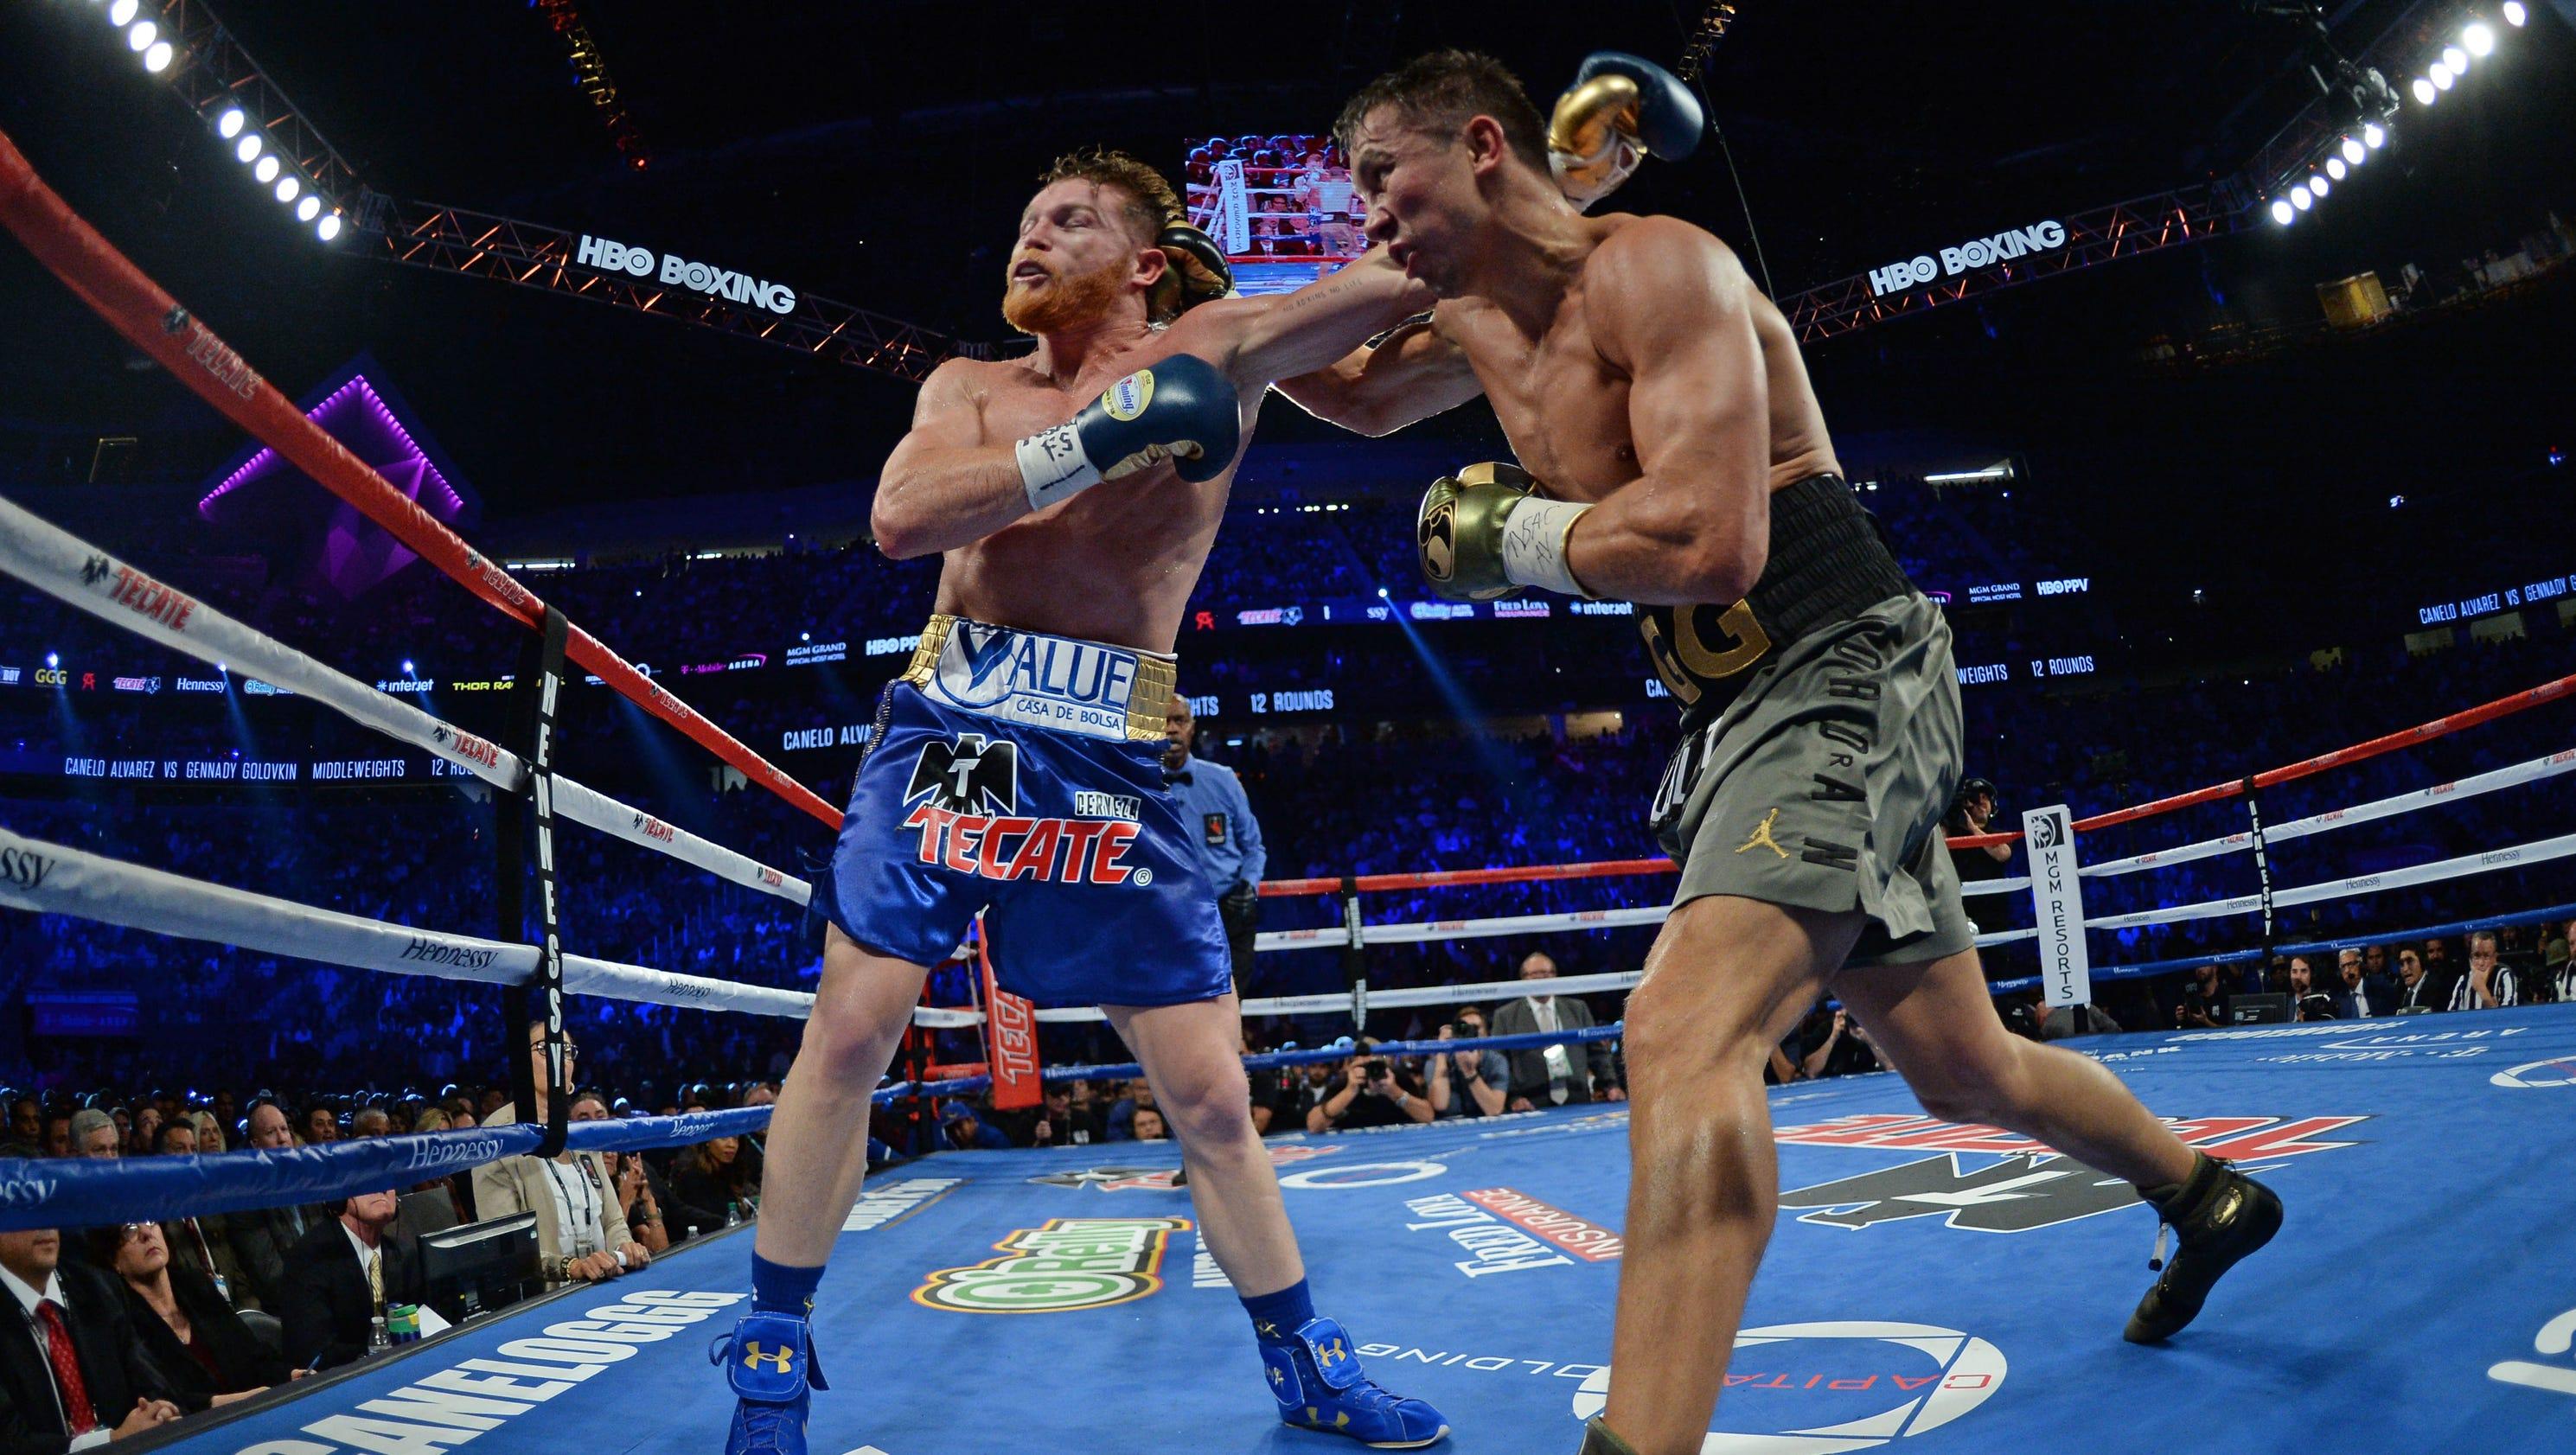 636412569449981983-usp-boxing--canelo-vs-golovkin.1